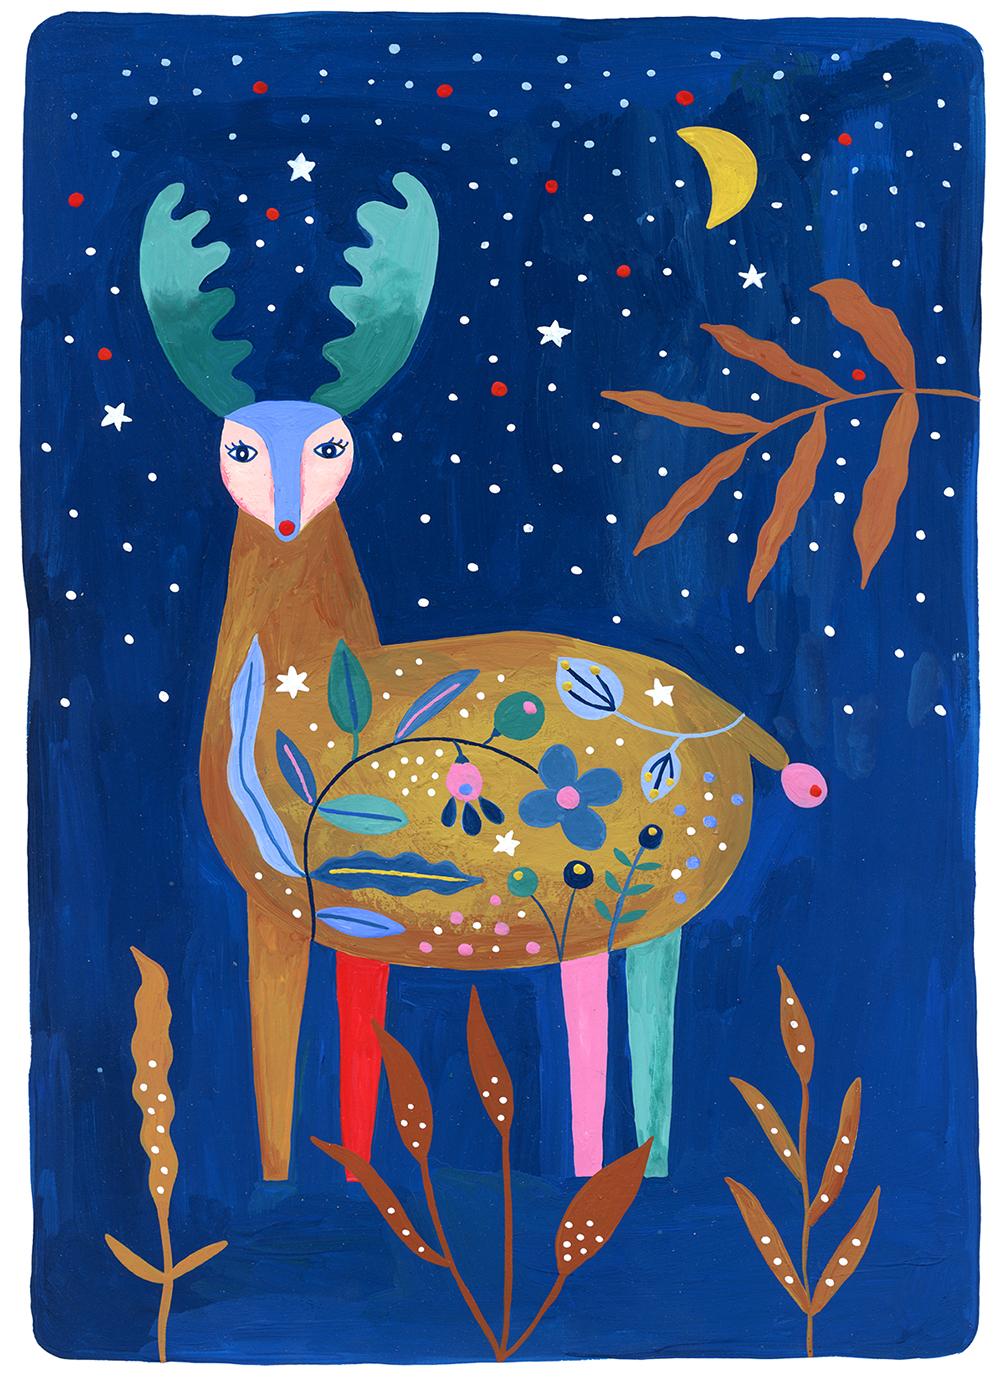 Art Menagerie Lilla Rogers 2018, reindeer by Marenthe.jpg